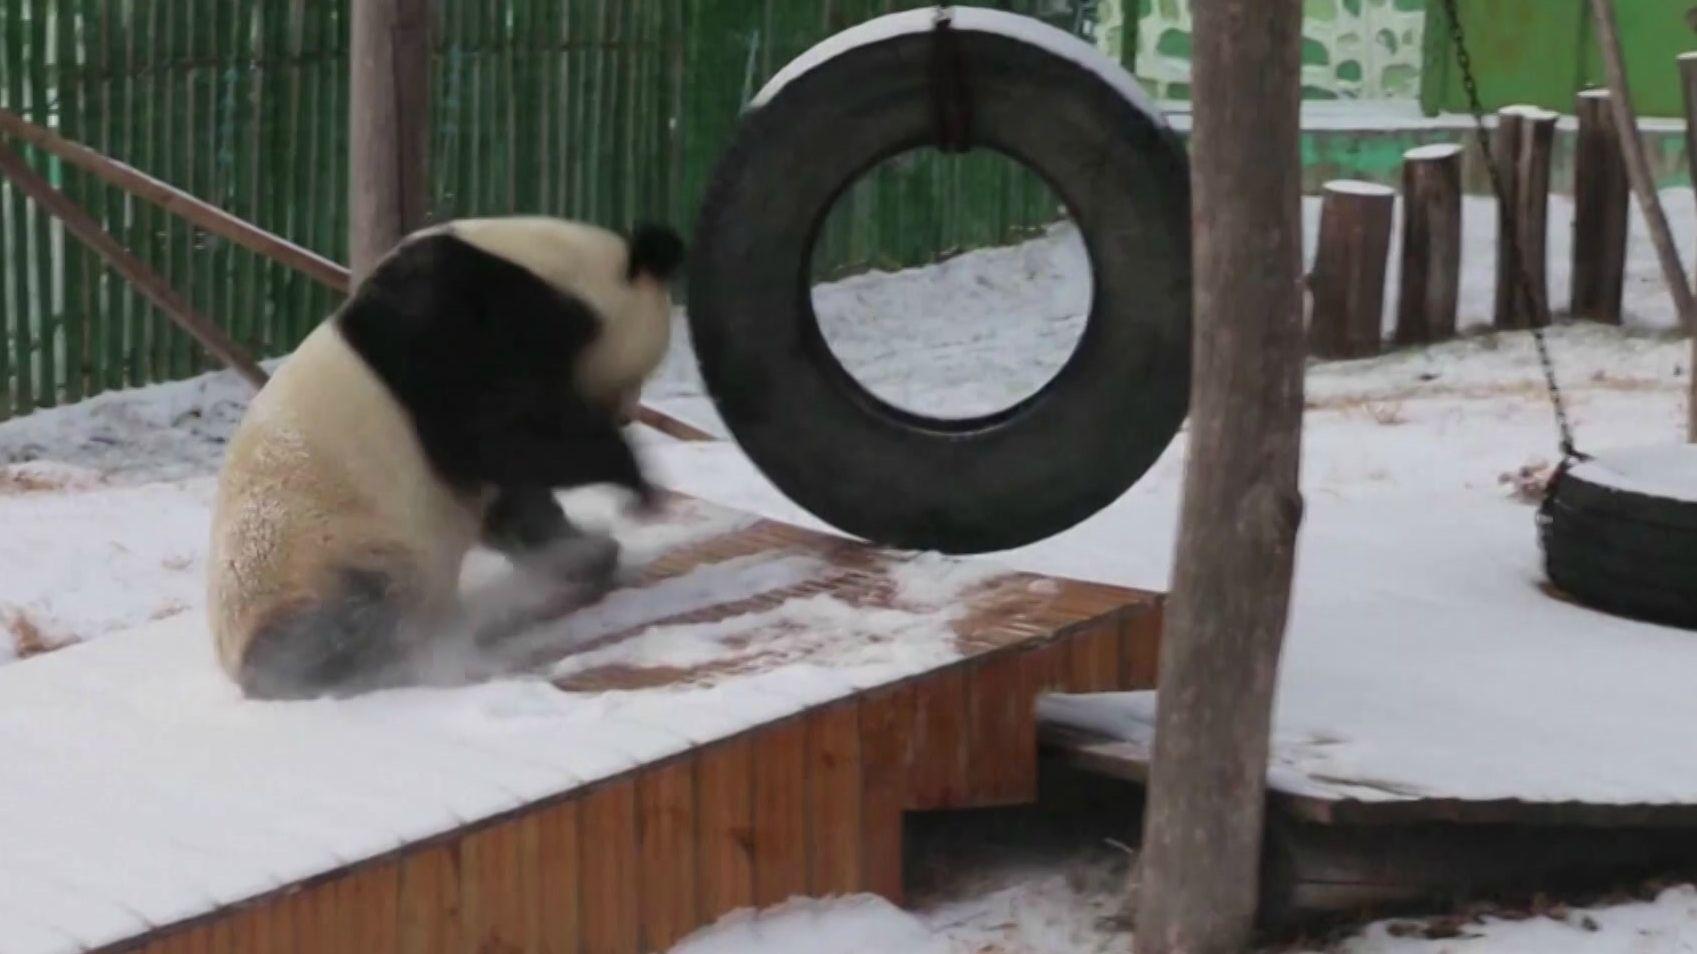 Panda tollt im Schnee